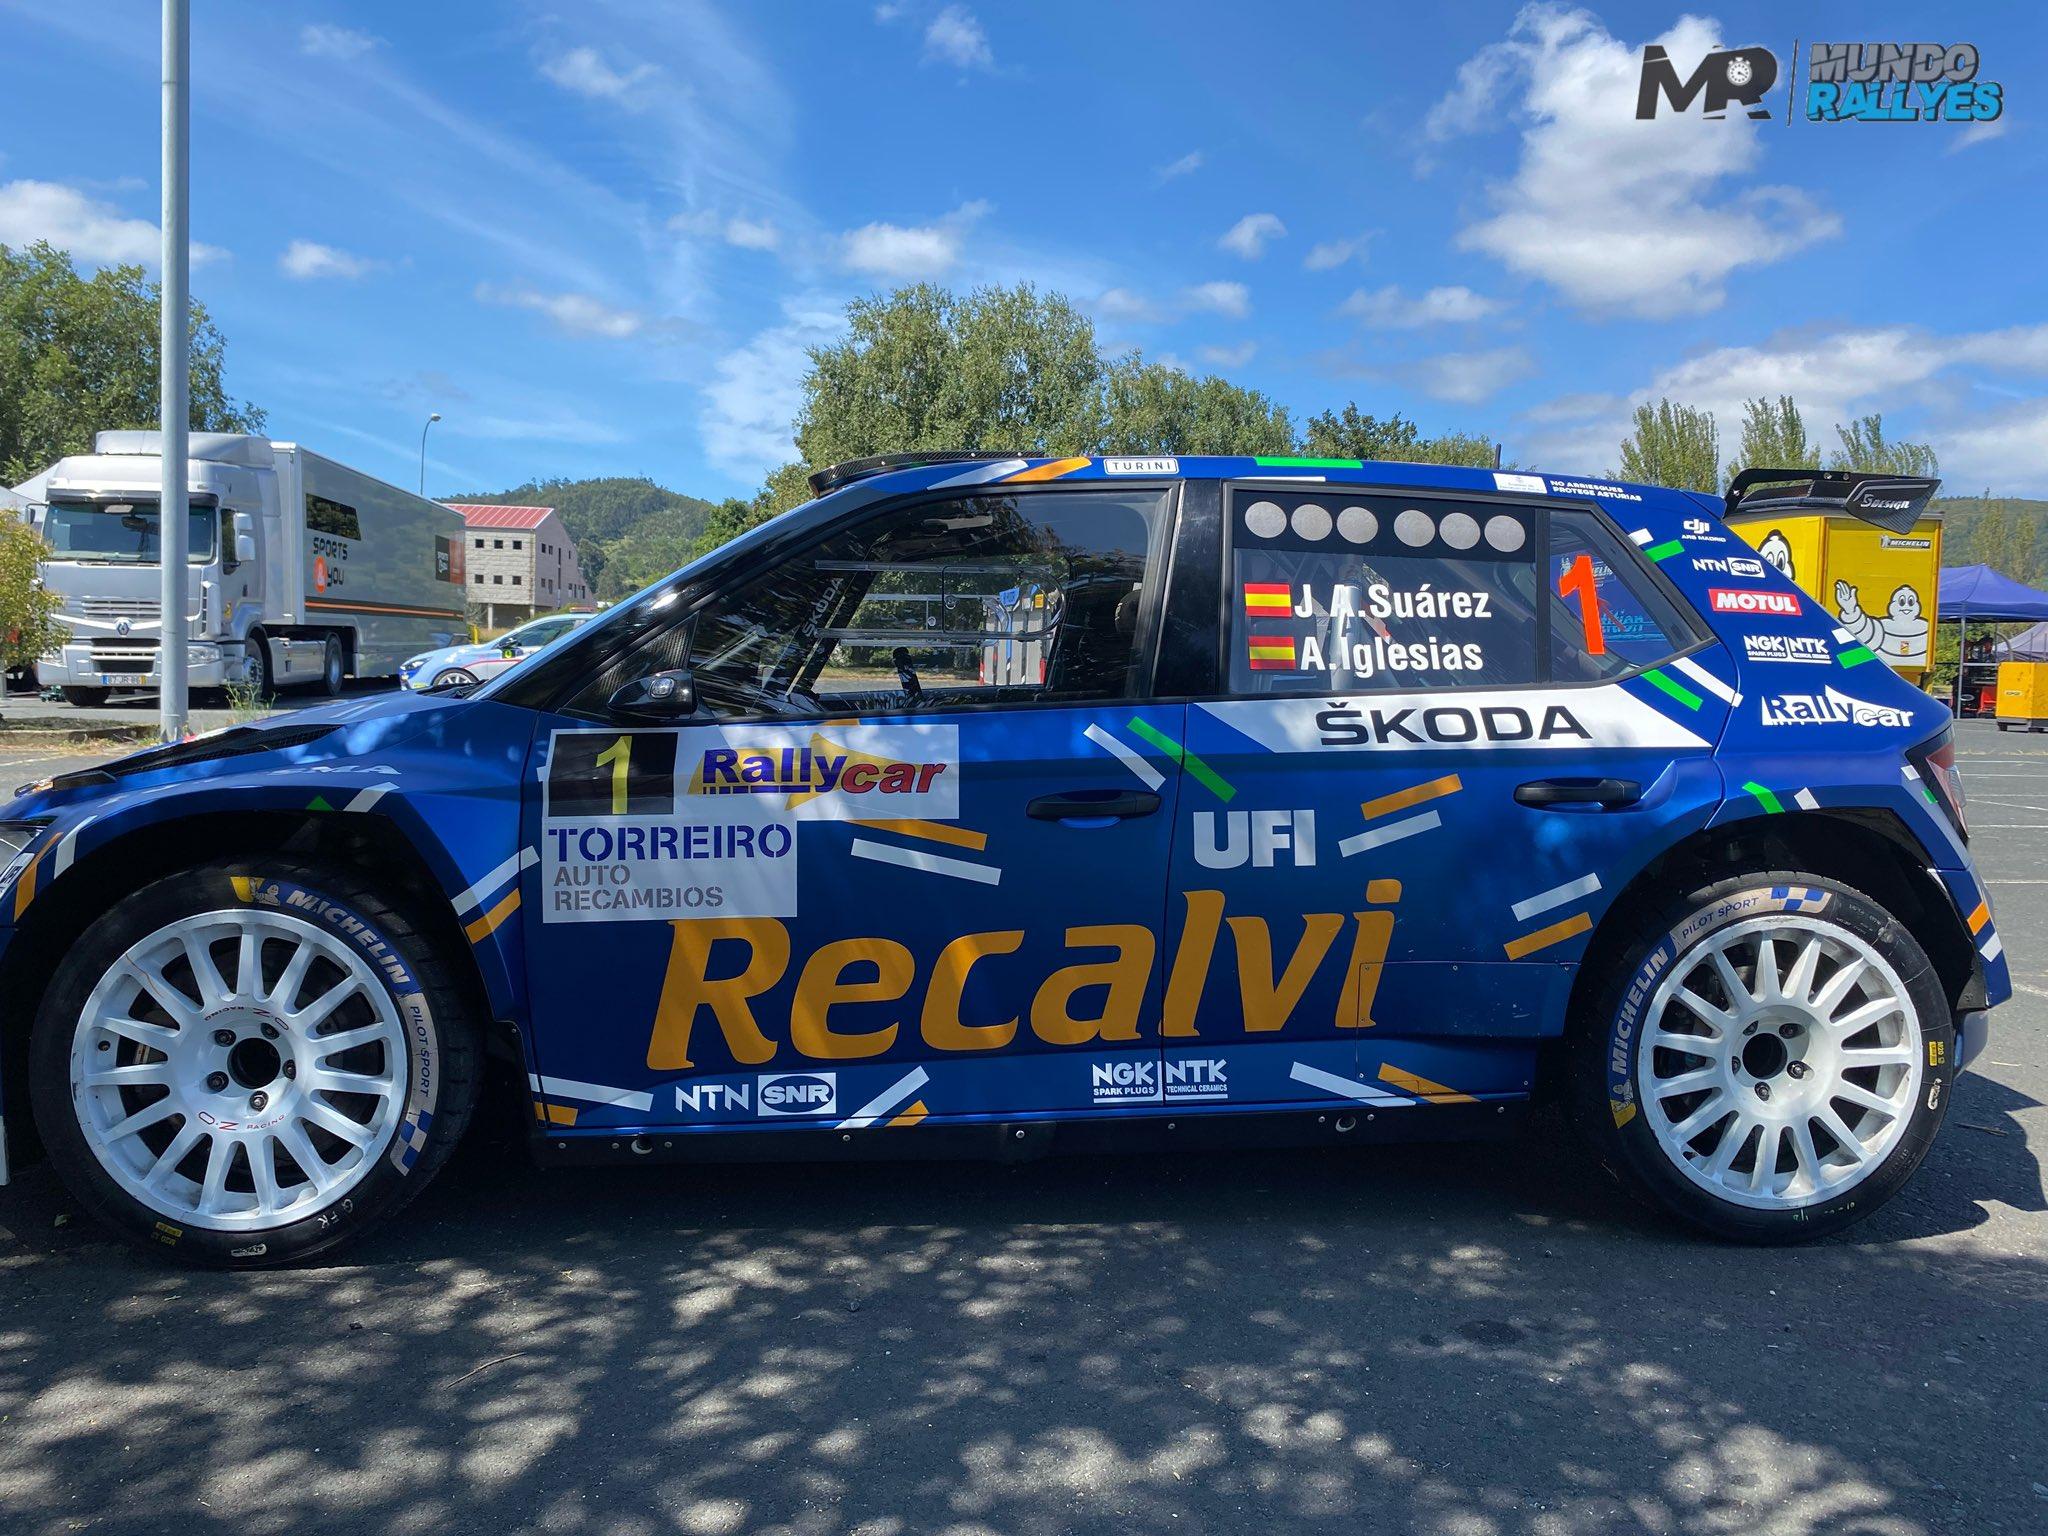 SCER + TER: 52º Rallye de Ferrol - Suzuki [20-21 Agosto] E9KCjvGXoAUU-ti?format=jpg&name=large